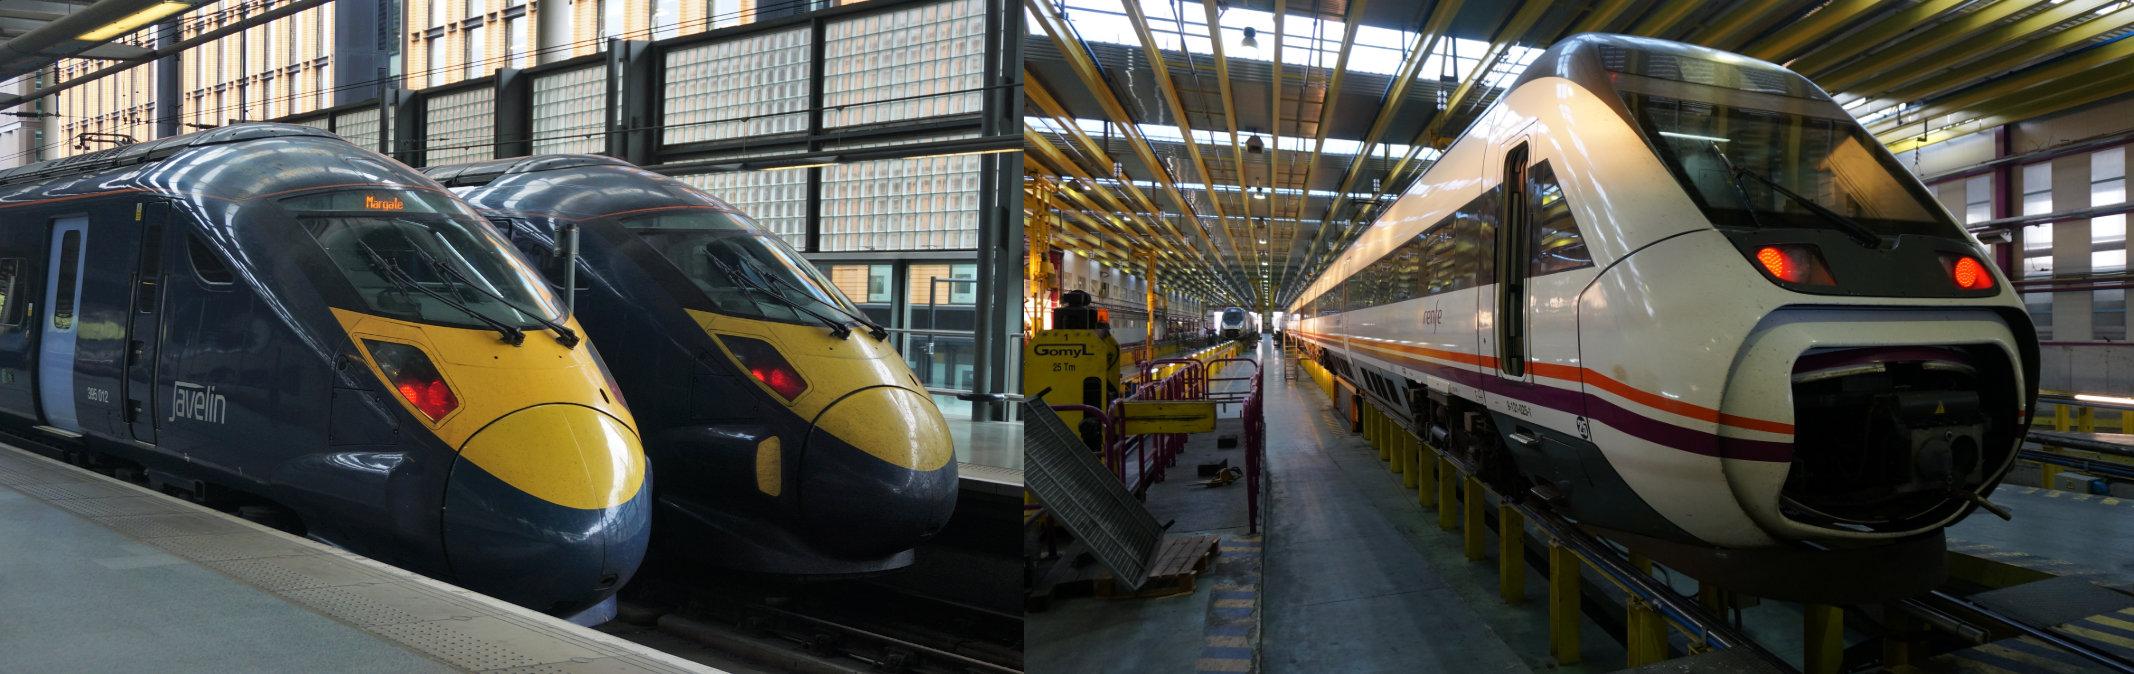 obrázek: British Rail řada 395 Javelin/RENFE řada 121